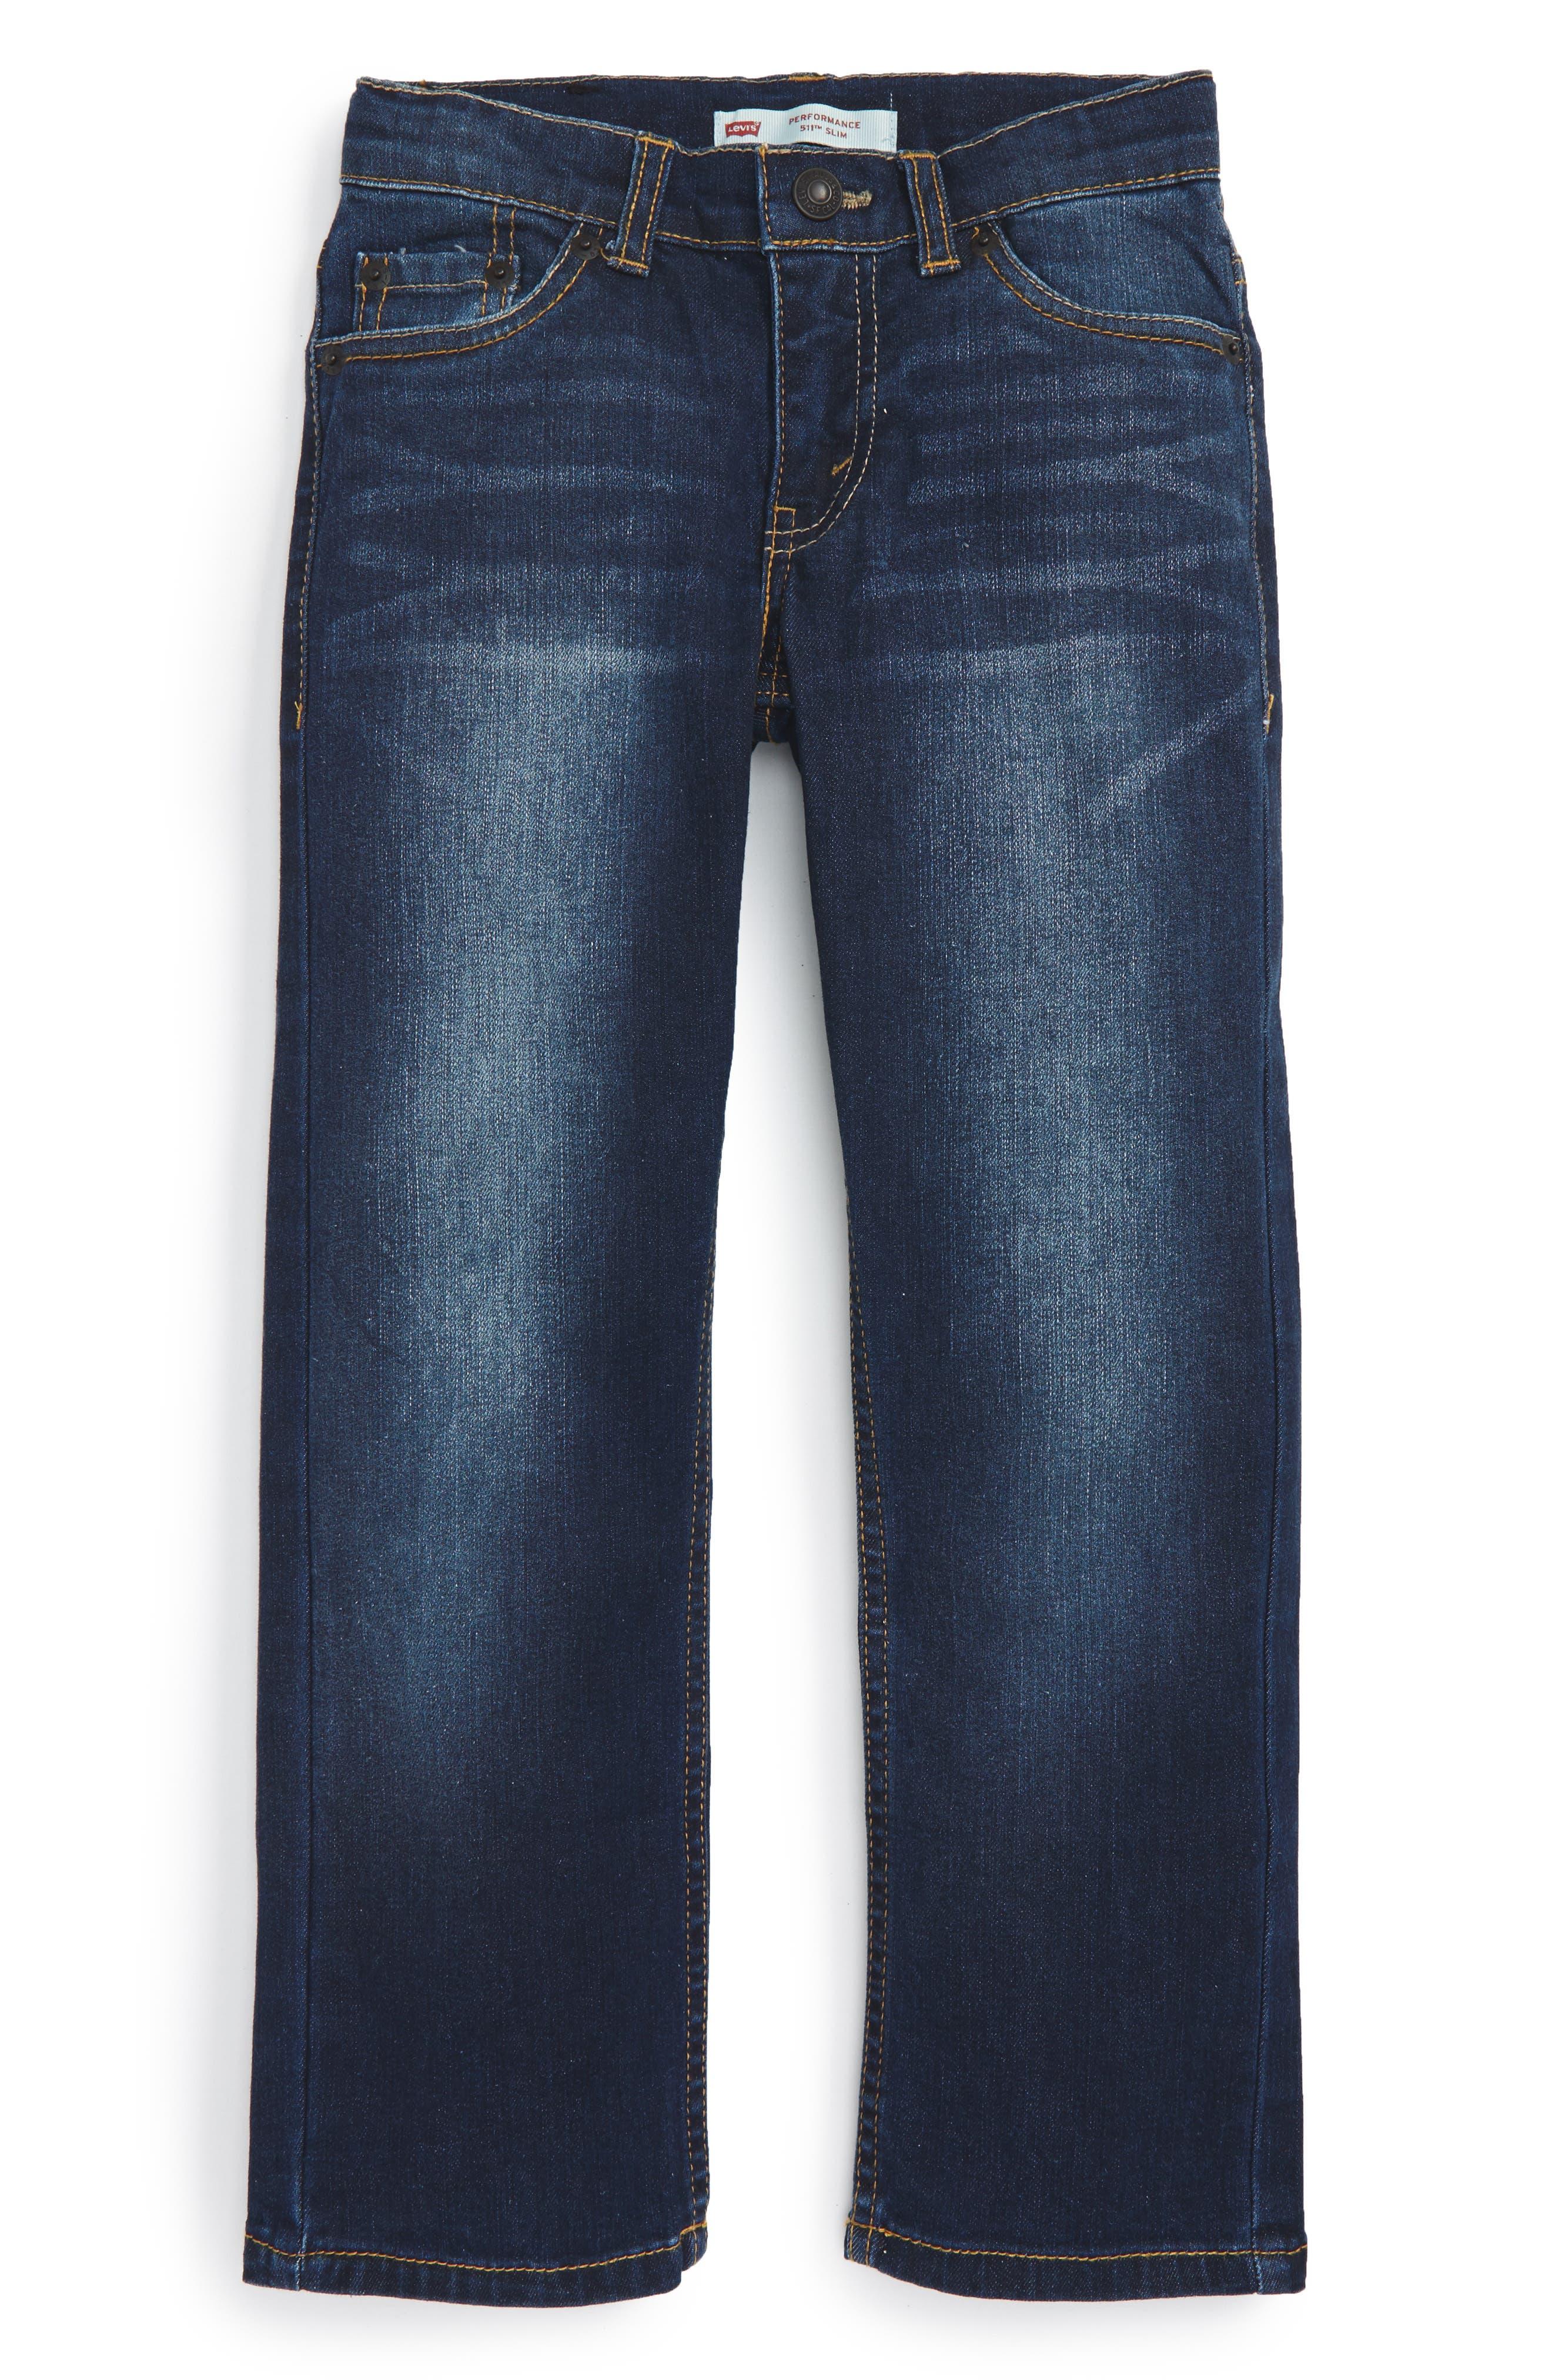 Main Image - Levi's® 511™ Knit Slim Leg Jeans (Toddler Boys & Little Boys)